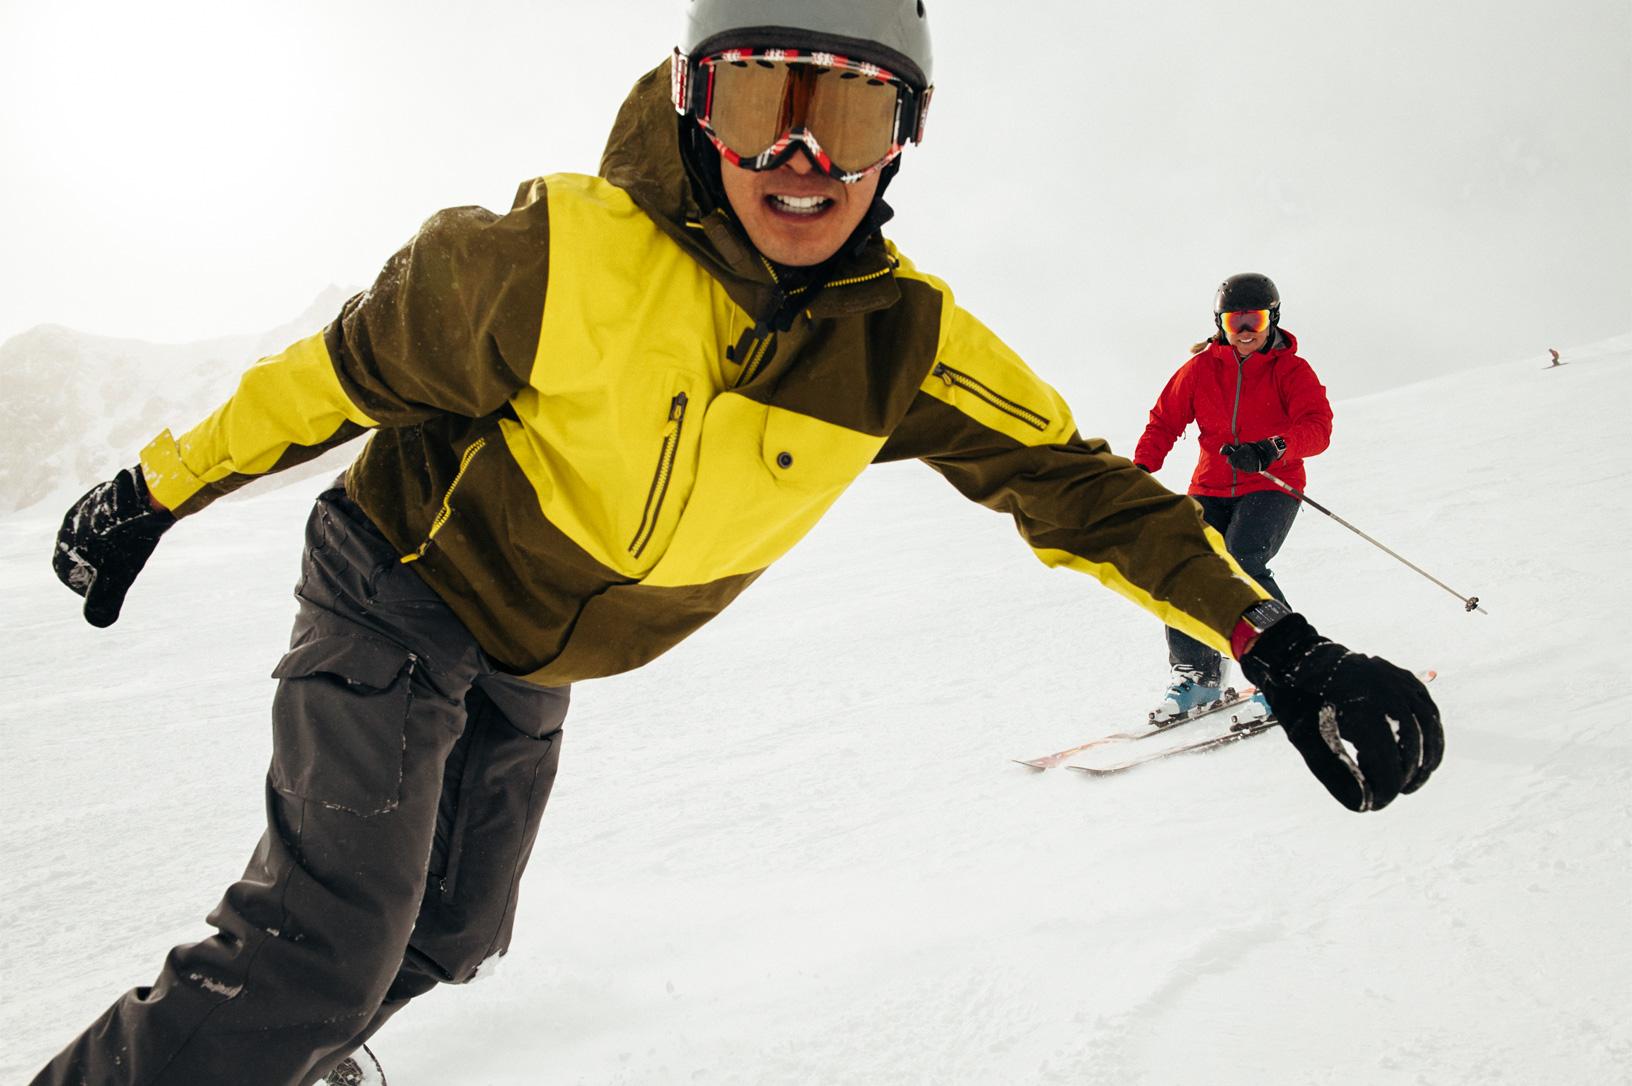 Apple Watch Ski Snowboard